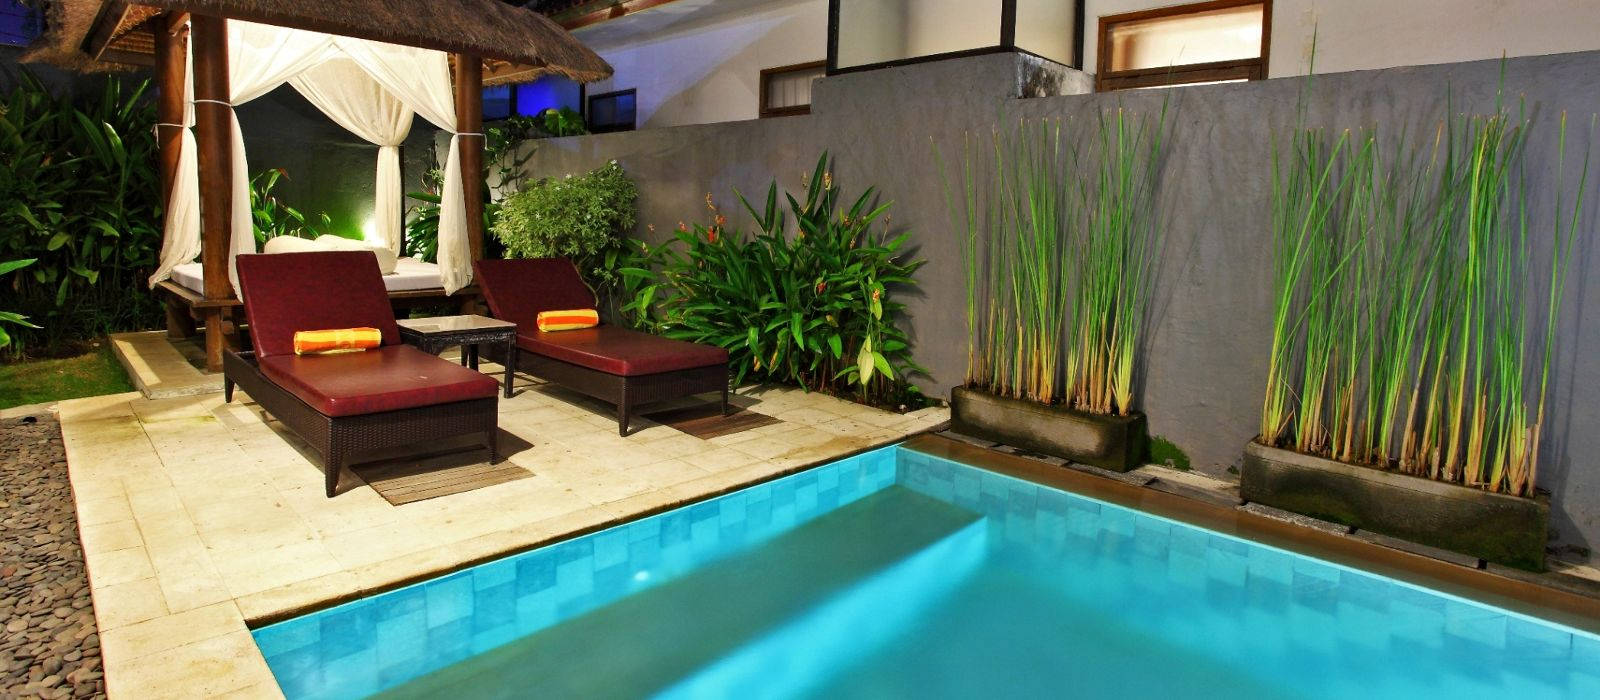 Hotel Puri Saron  Indonesia